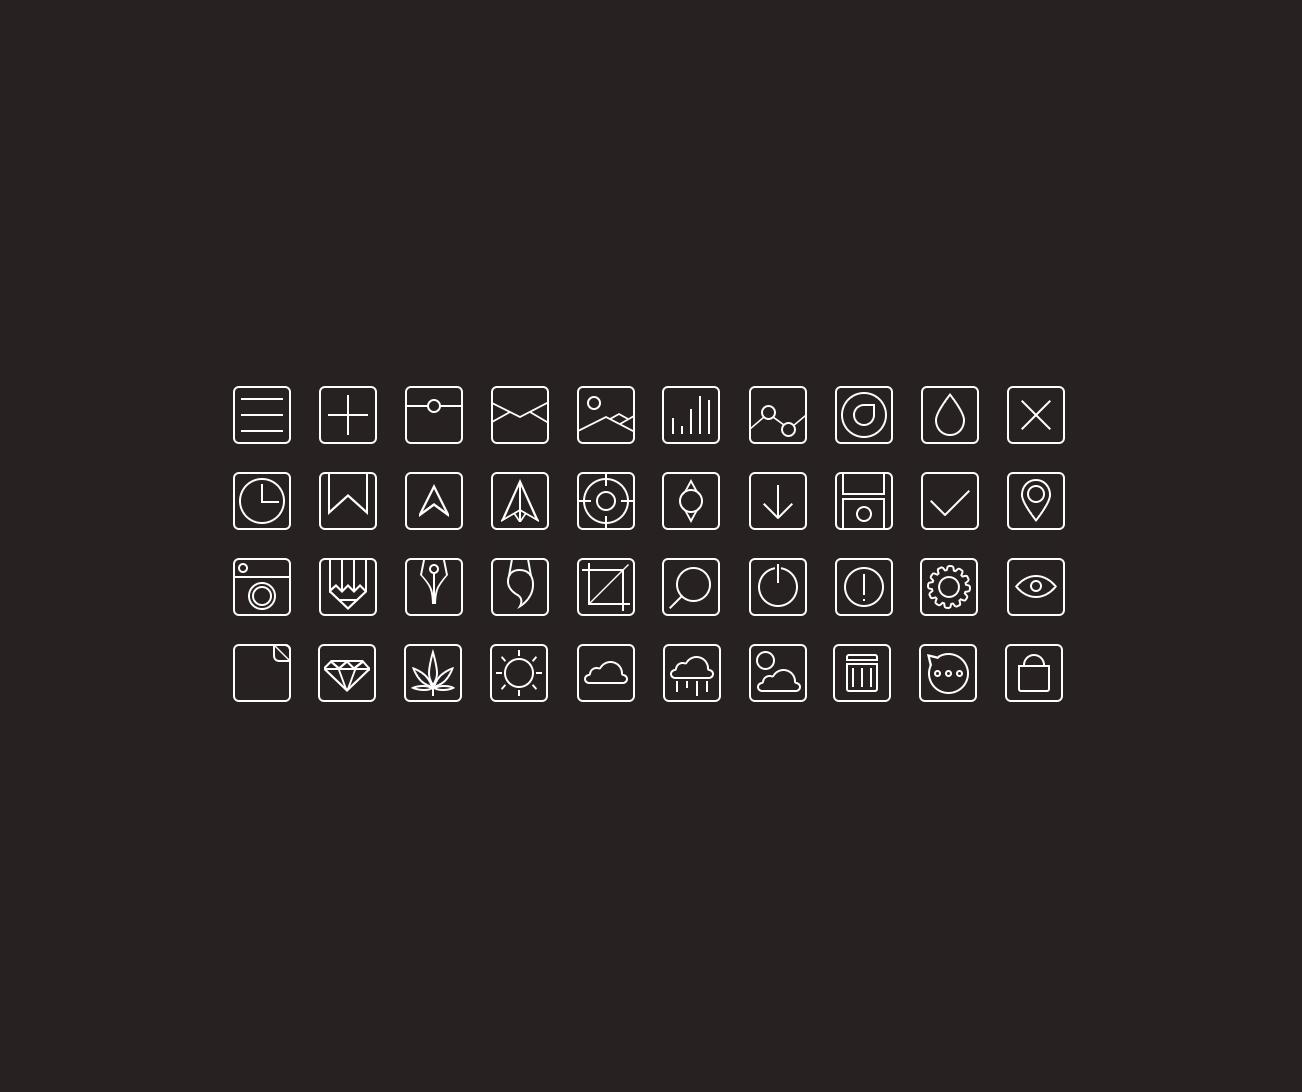 thin minimal icons тонки минималистичные иконки, пиктограммы, flat, ui, dribbble